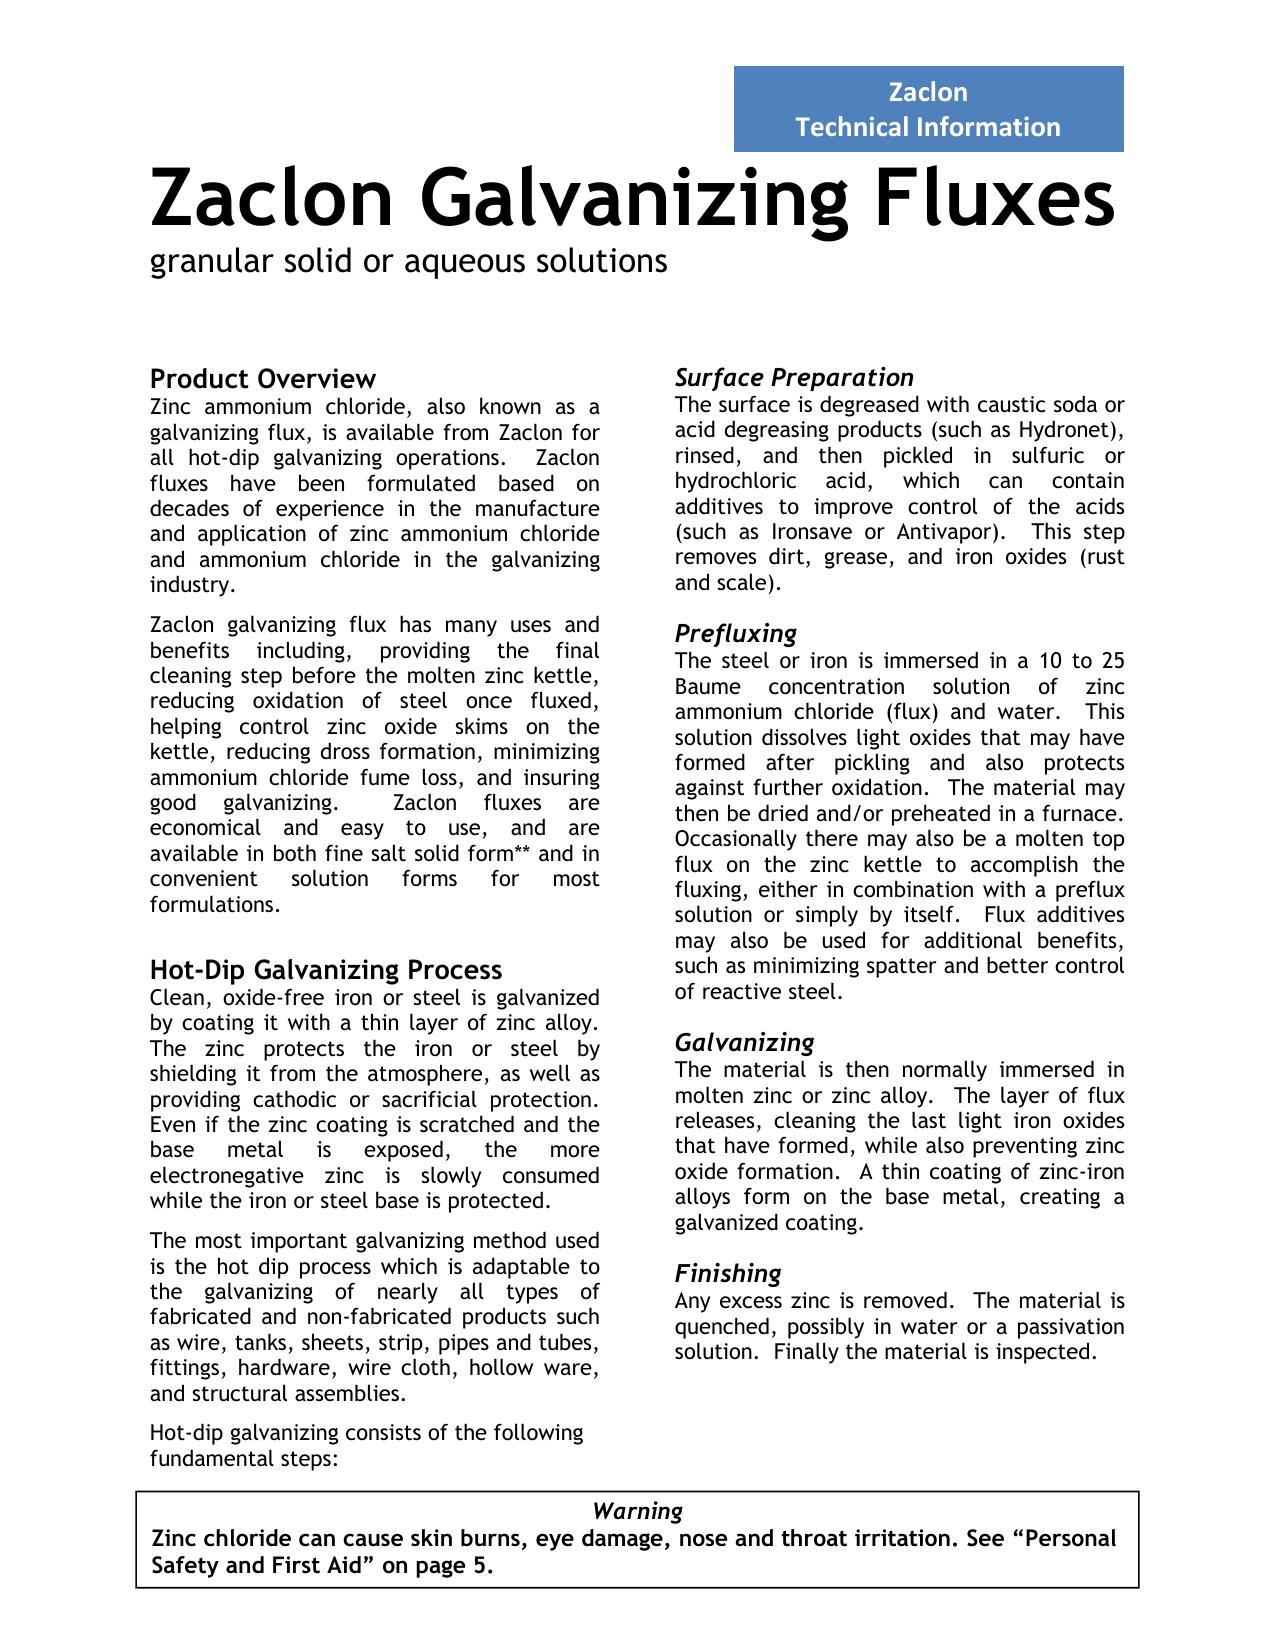 Zaclon Galvanizing Fluxes Datasheet | manualzz com